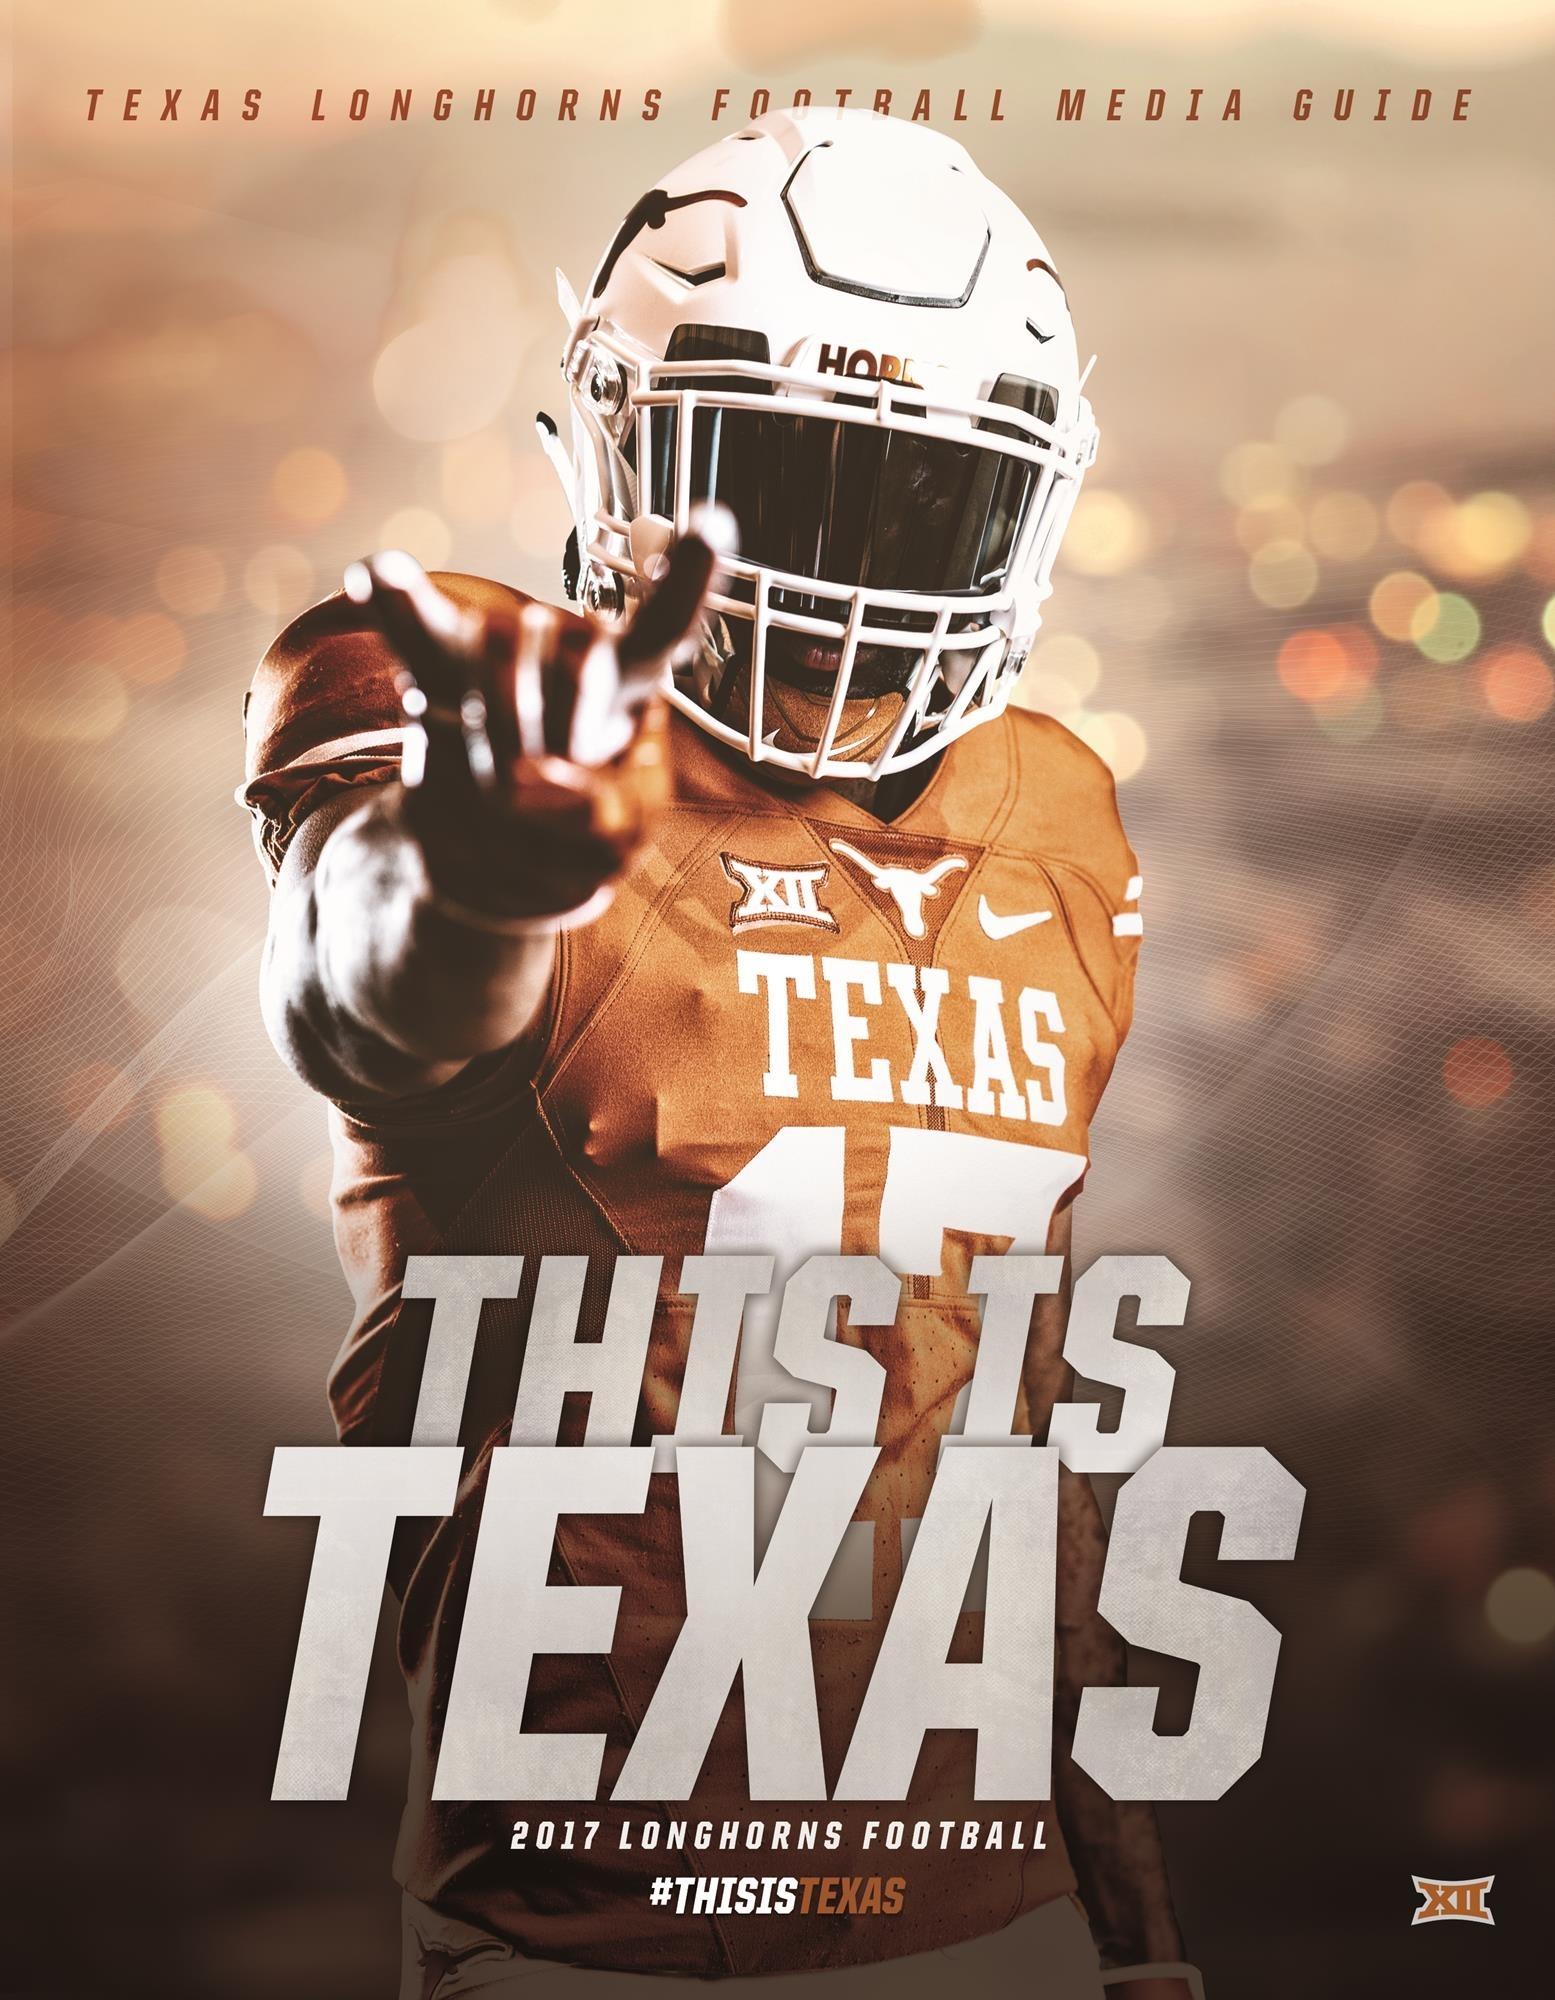 football media guide - university of texas